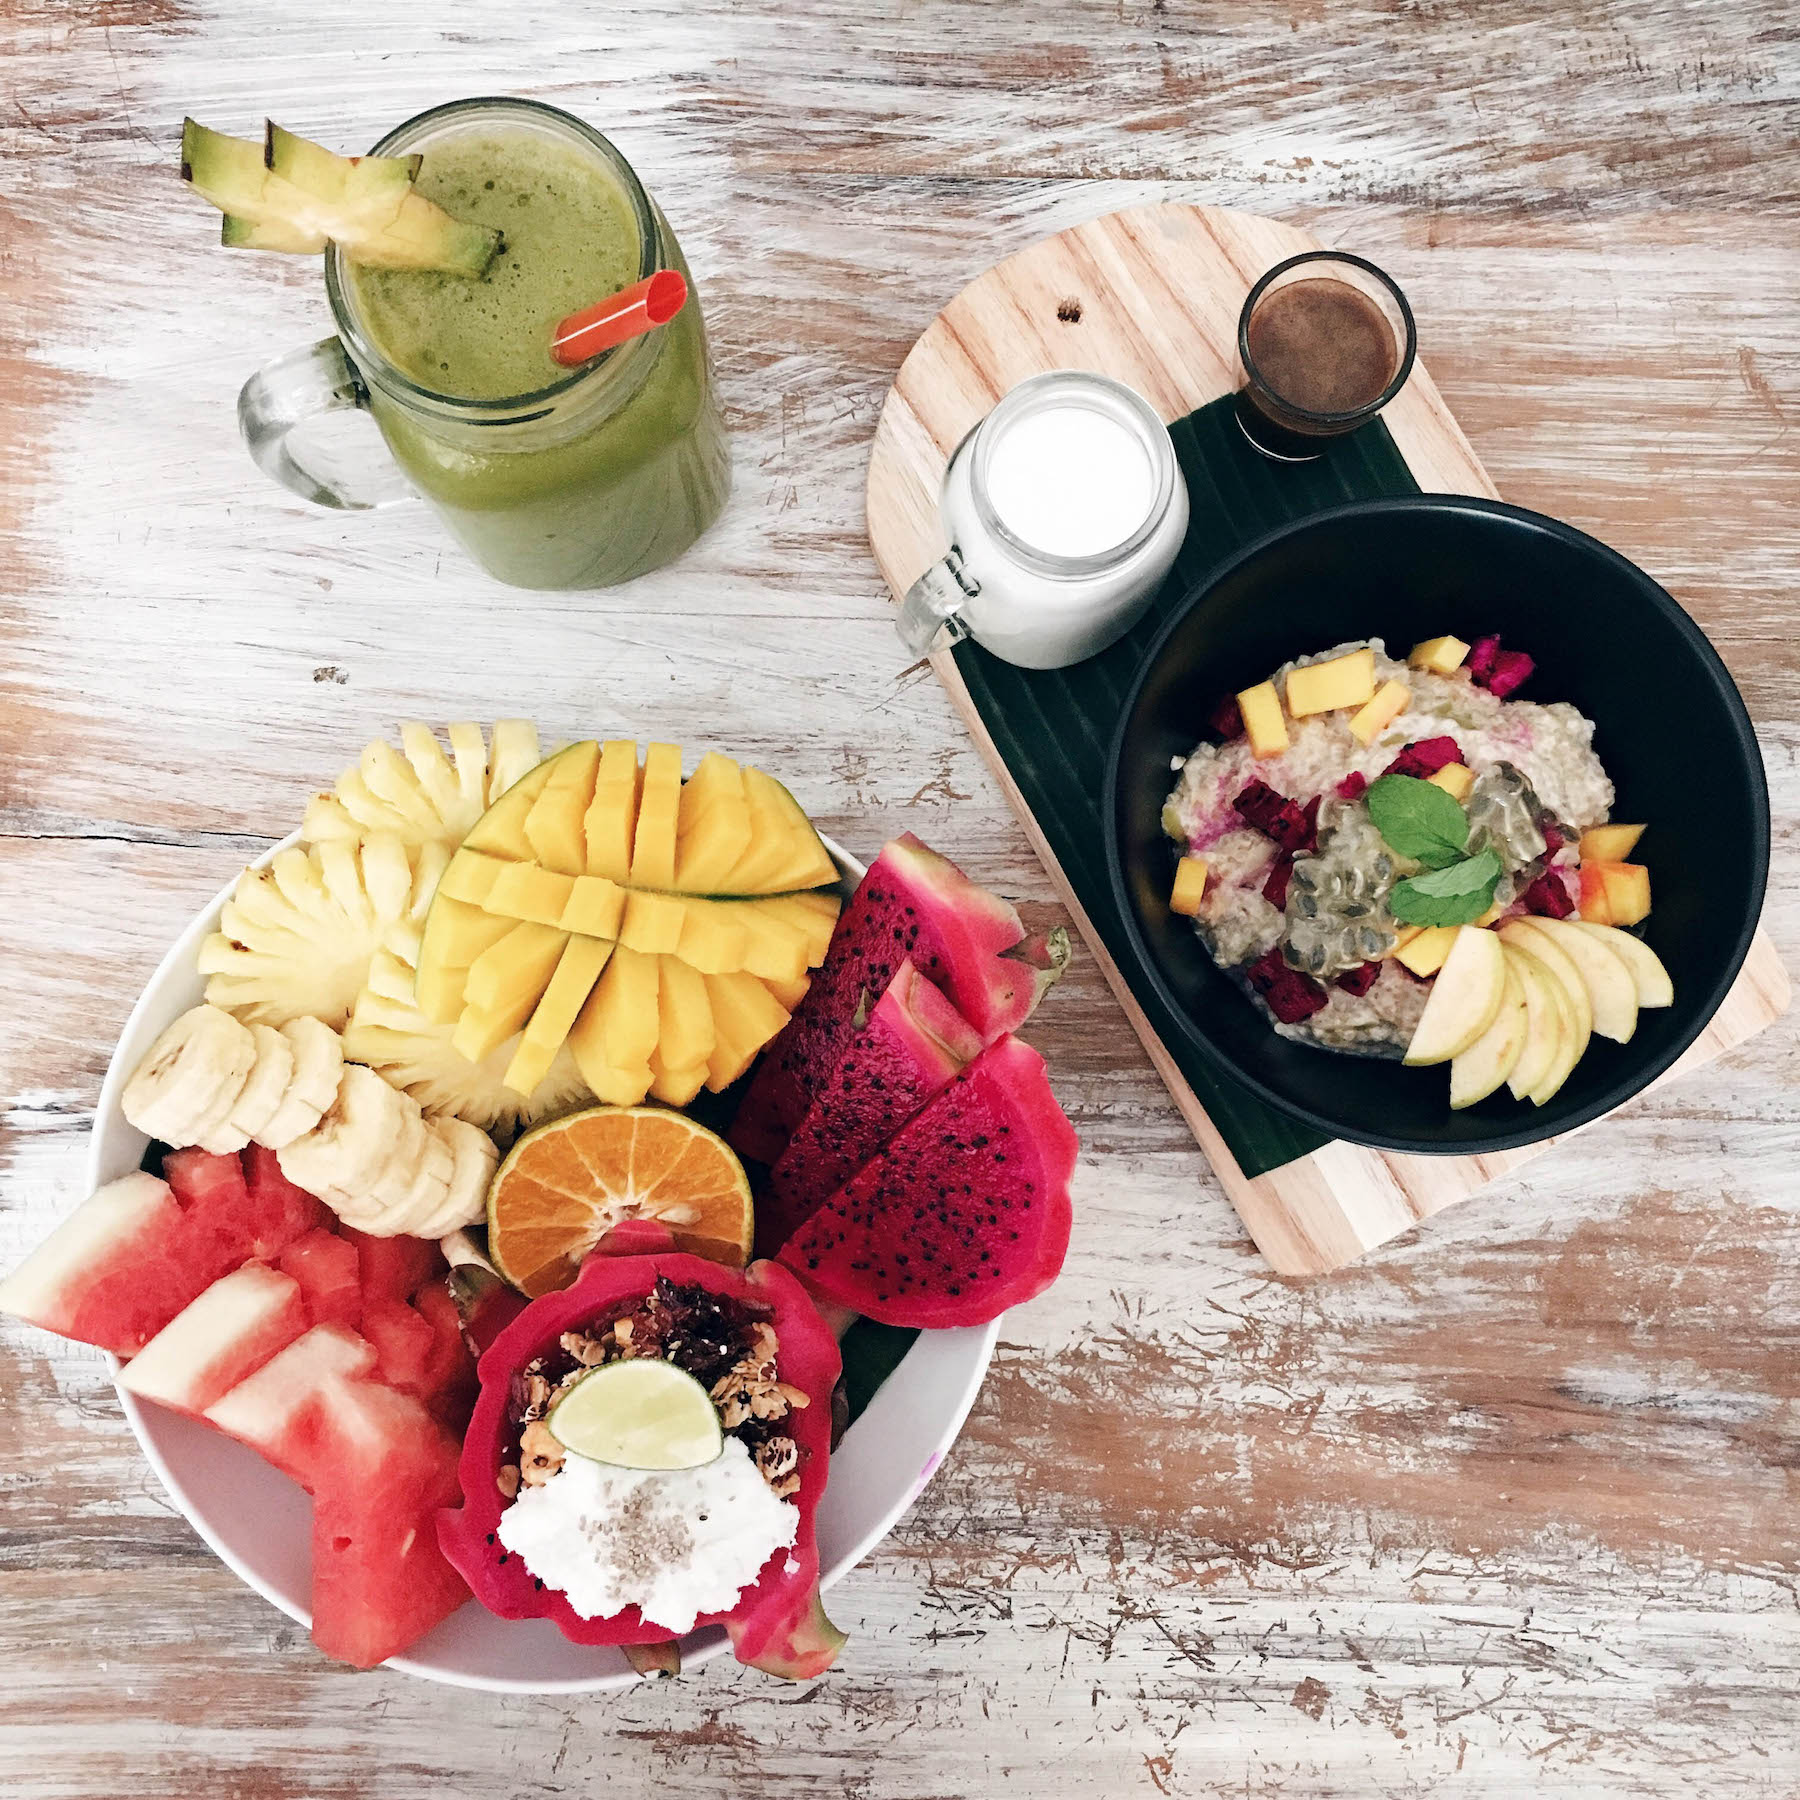 healthy eating wedding-challenge Bali breakfast suelovesnyc_susan_fengler_healthy_eating_wedding_challenge_breakfast_bali